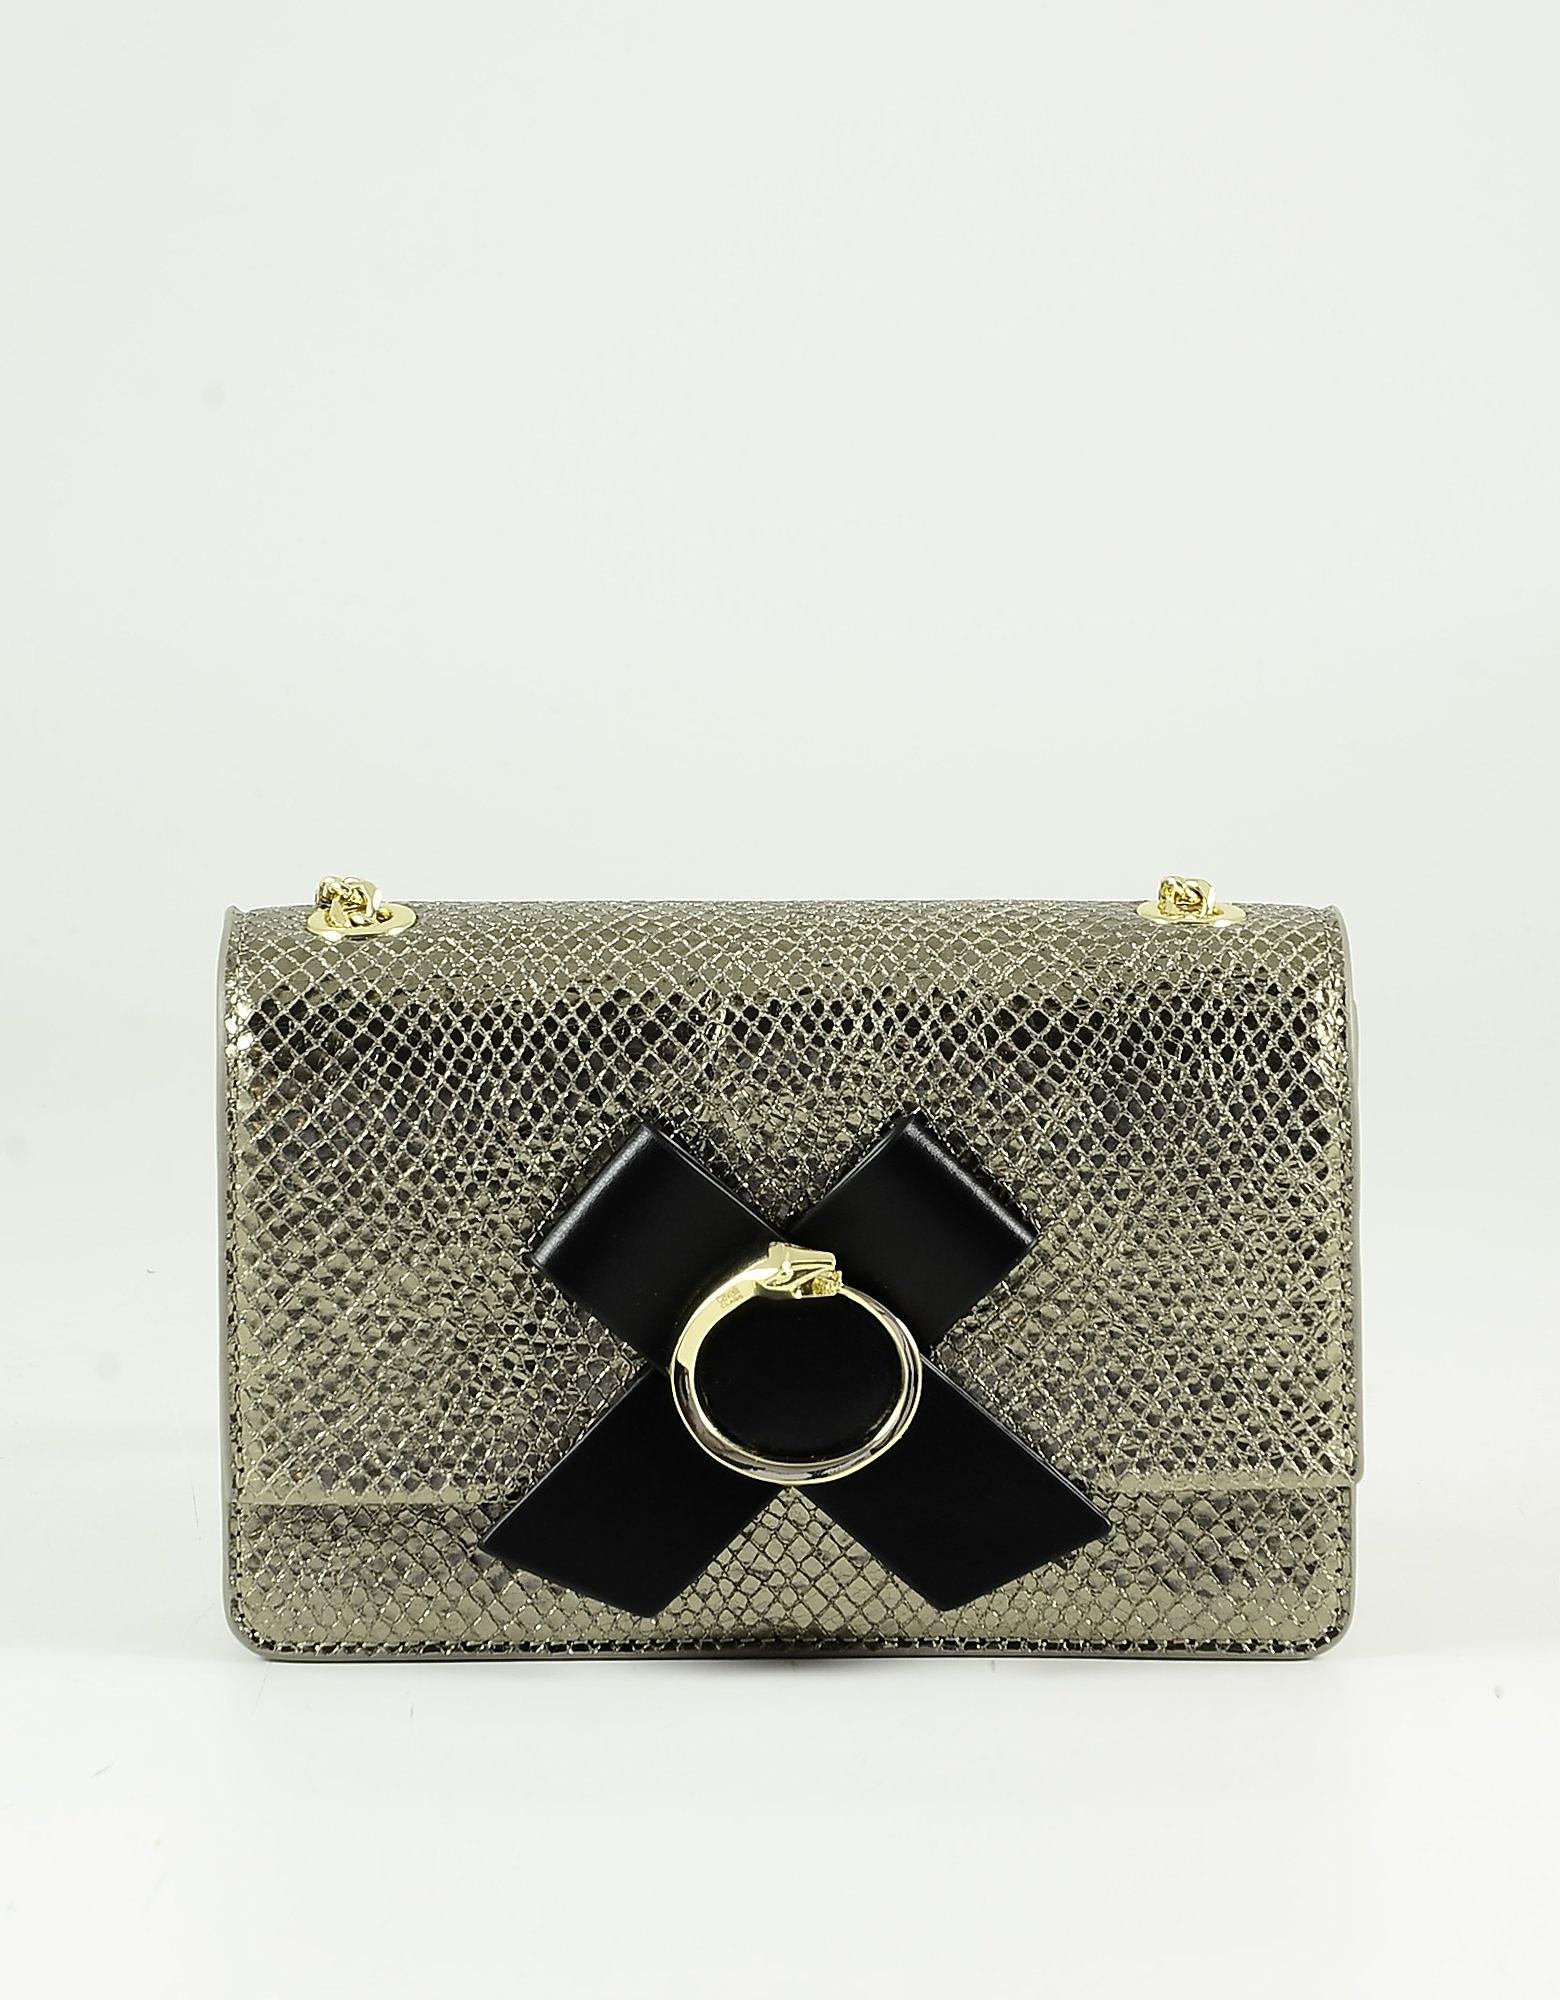 Class Roberto Cavalli Animal Print Gold Eco-leather Shoulder Bag